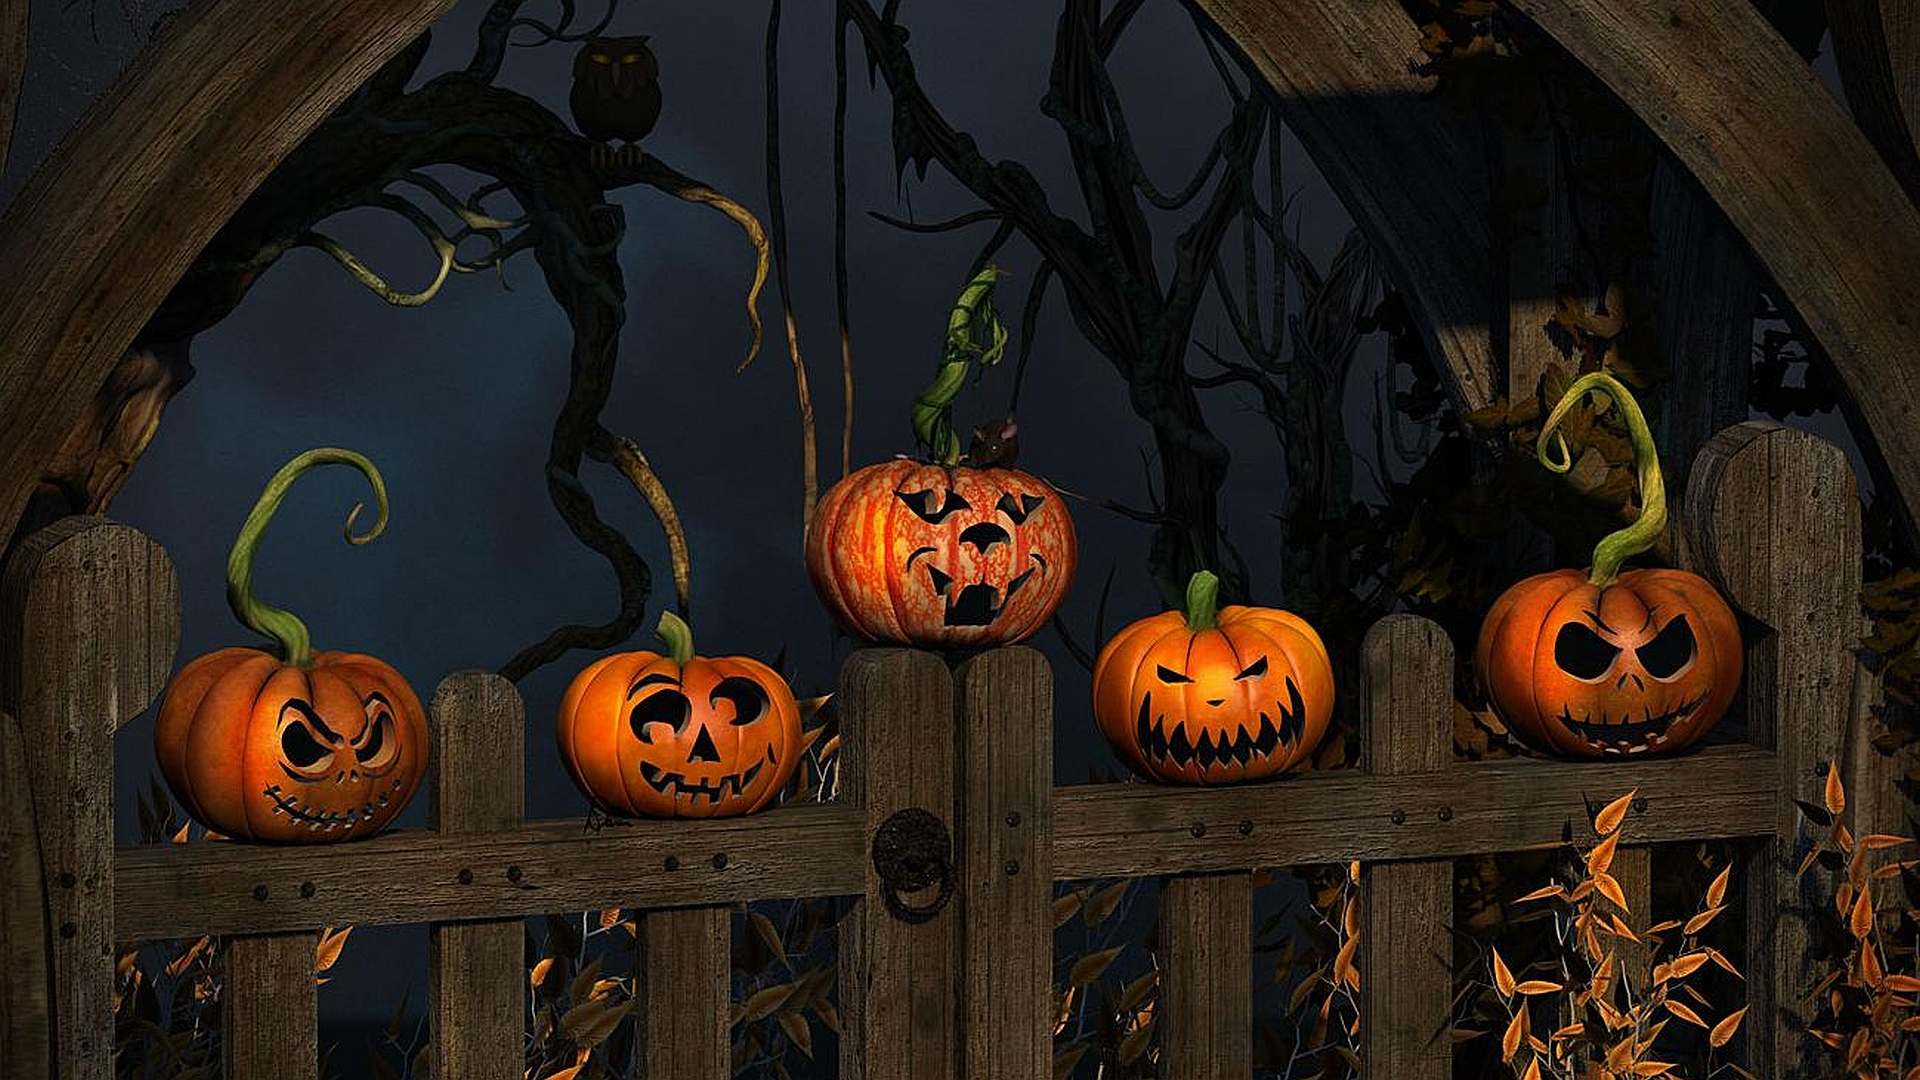 47] Halloween Desktop Wallpaper 1920X1080 on WallpaperSafari 1920x1080